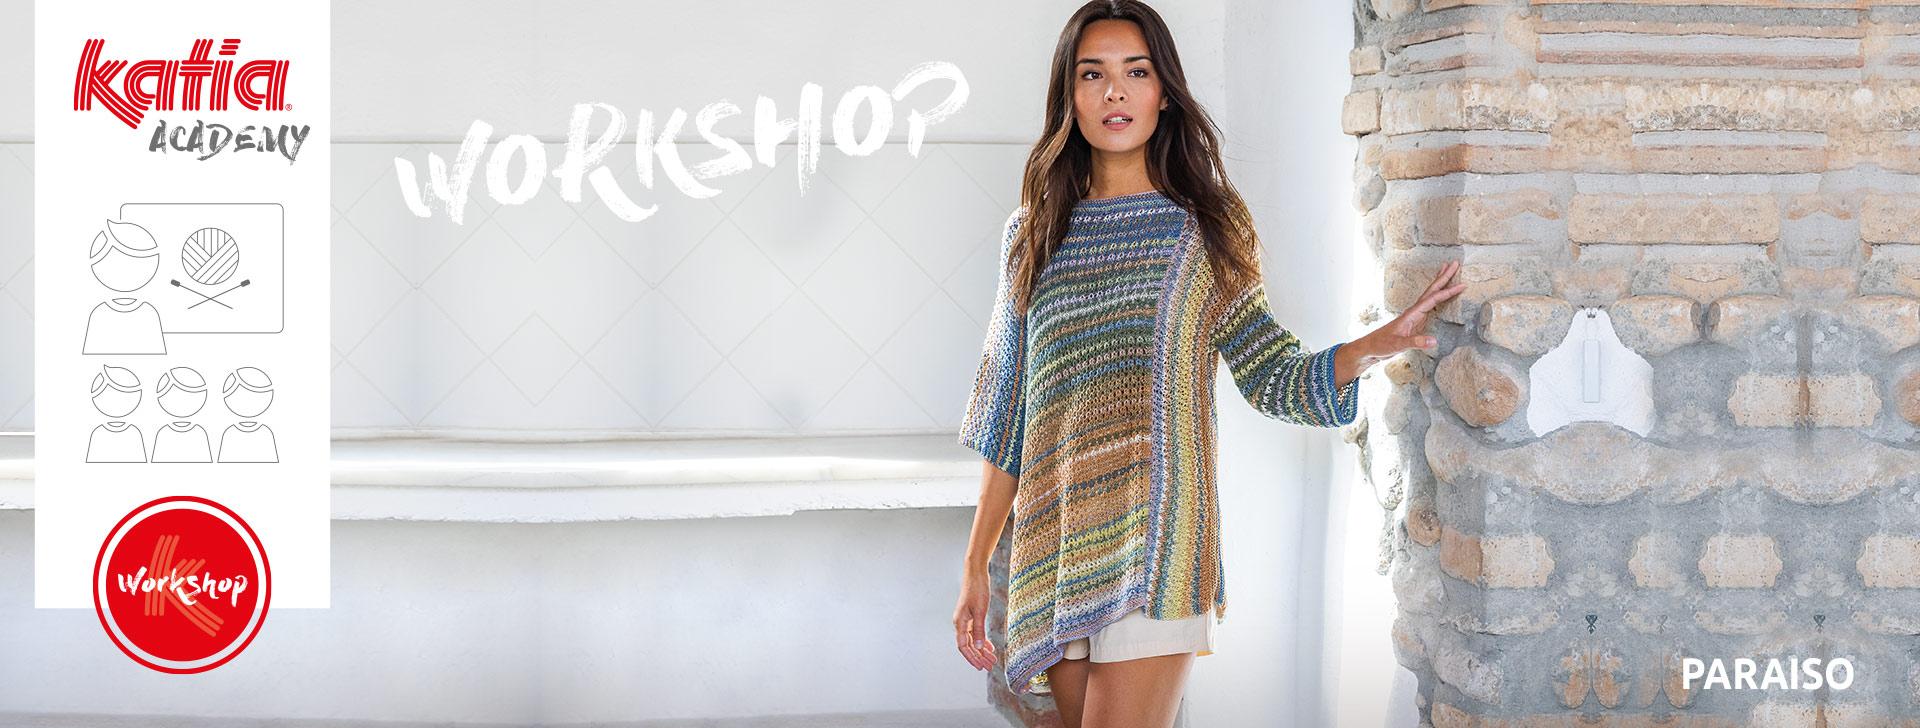 Katia Paraiso Asymmetric Sweater Workshop